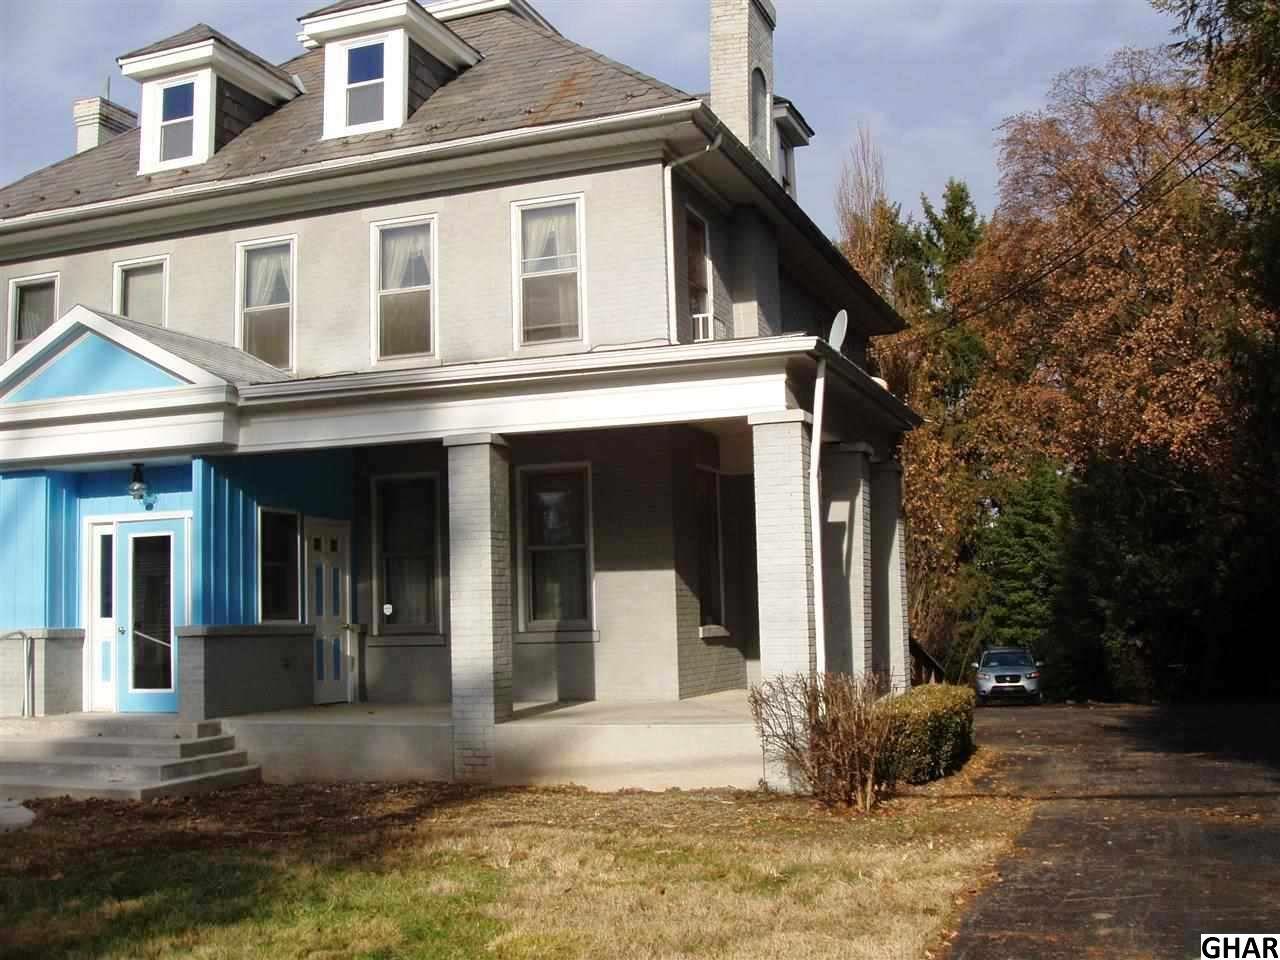 Rental Homes for Rent, ListingId:37184955, location: 616 W Main St Mechanicsburg 17055